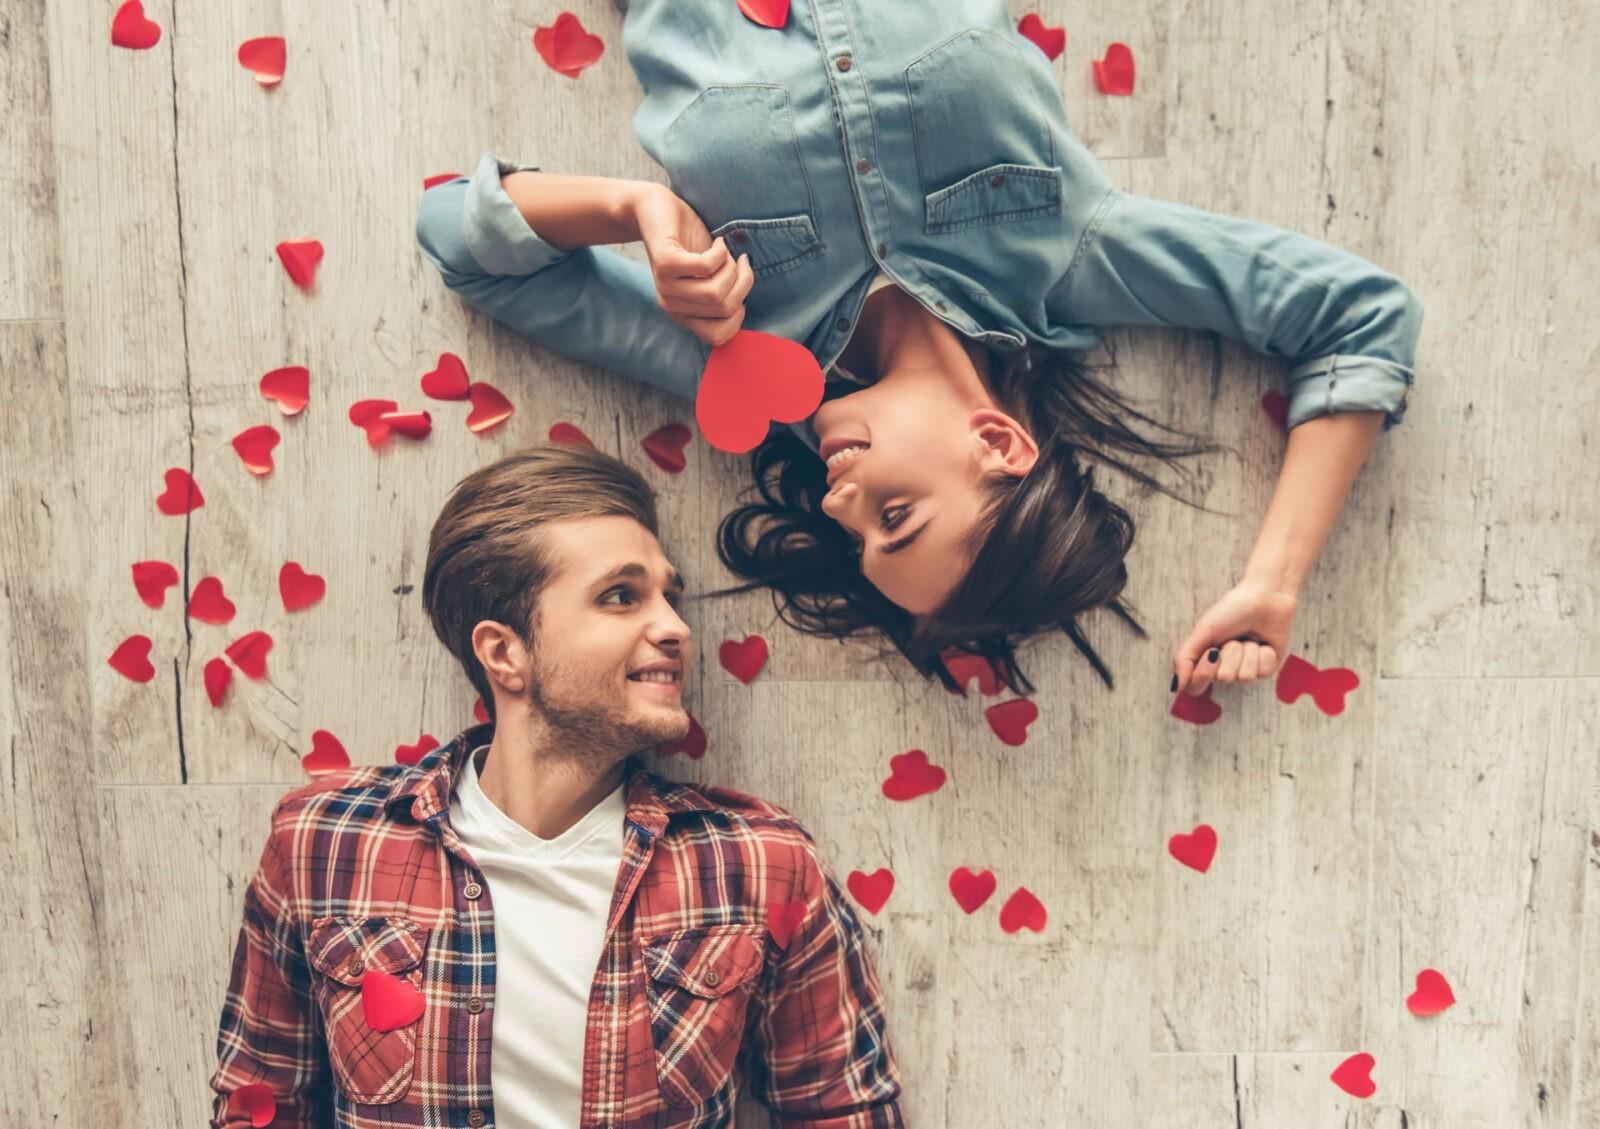 Свитспик сайт для знакомств Sweetspeak